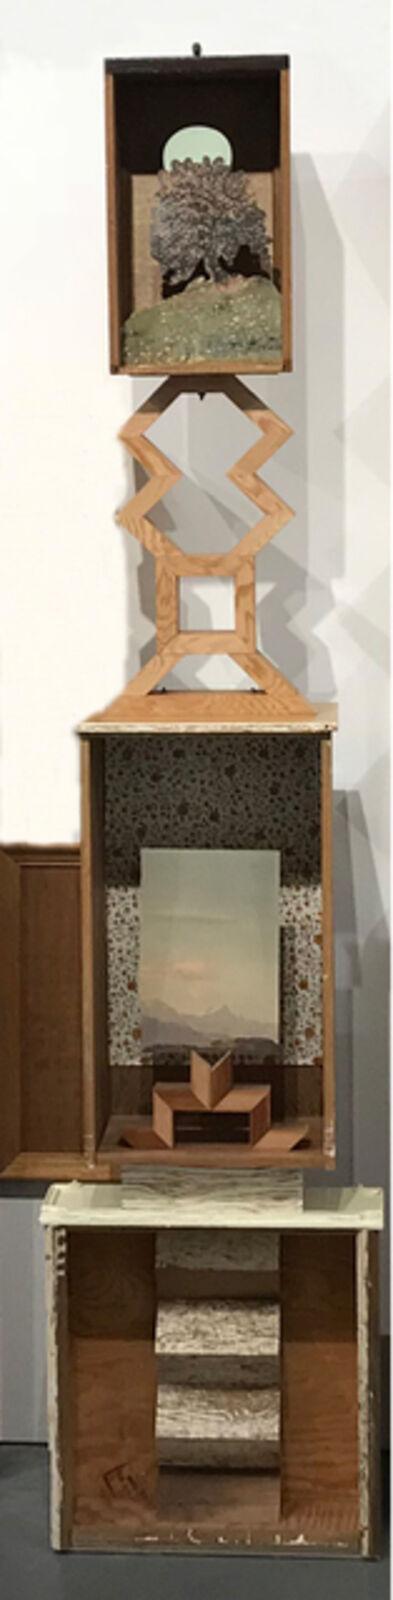 Alison Pebworth, 'Untitled 4, Cabinet Installation ', 2018